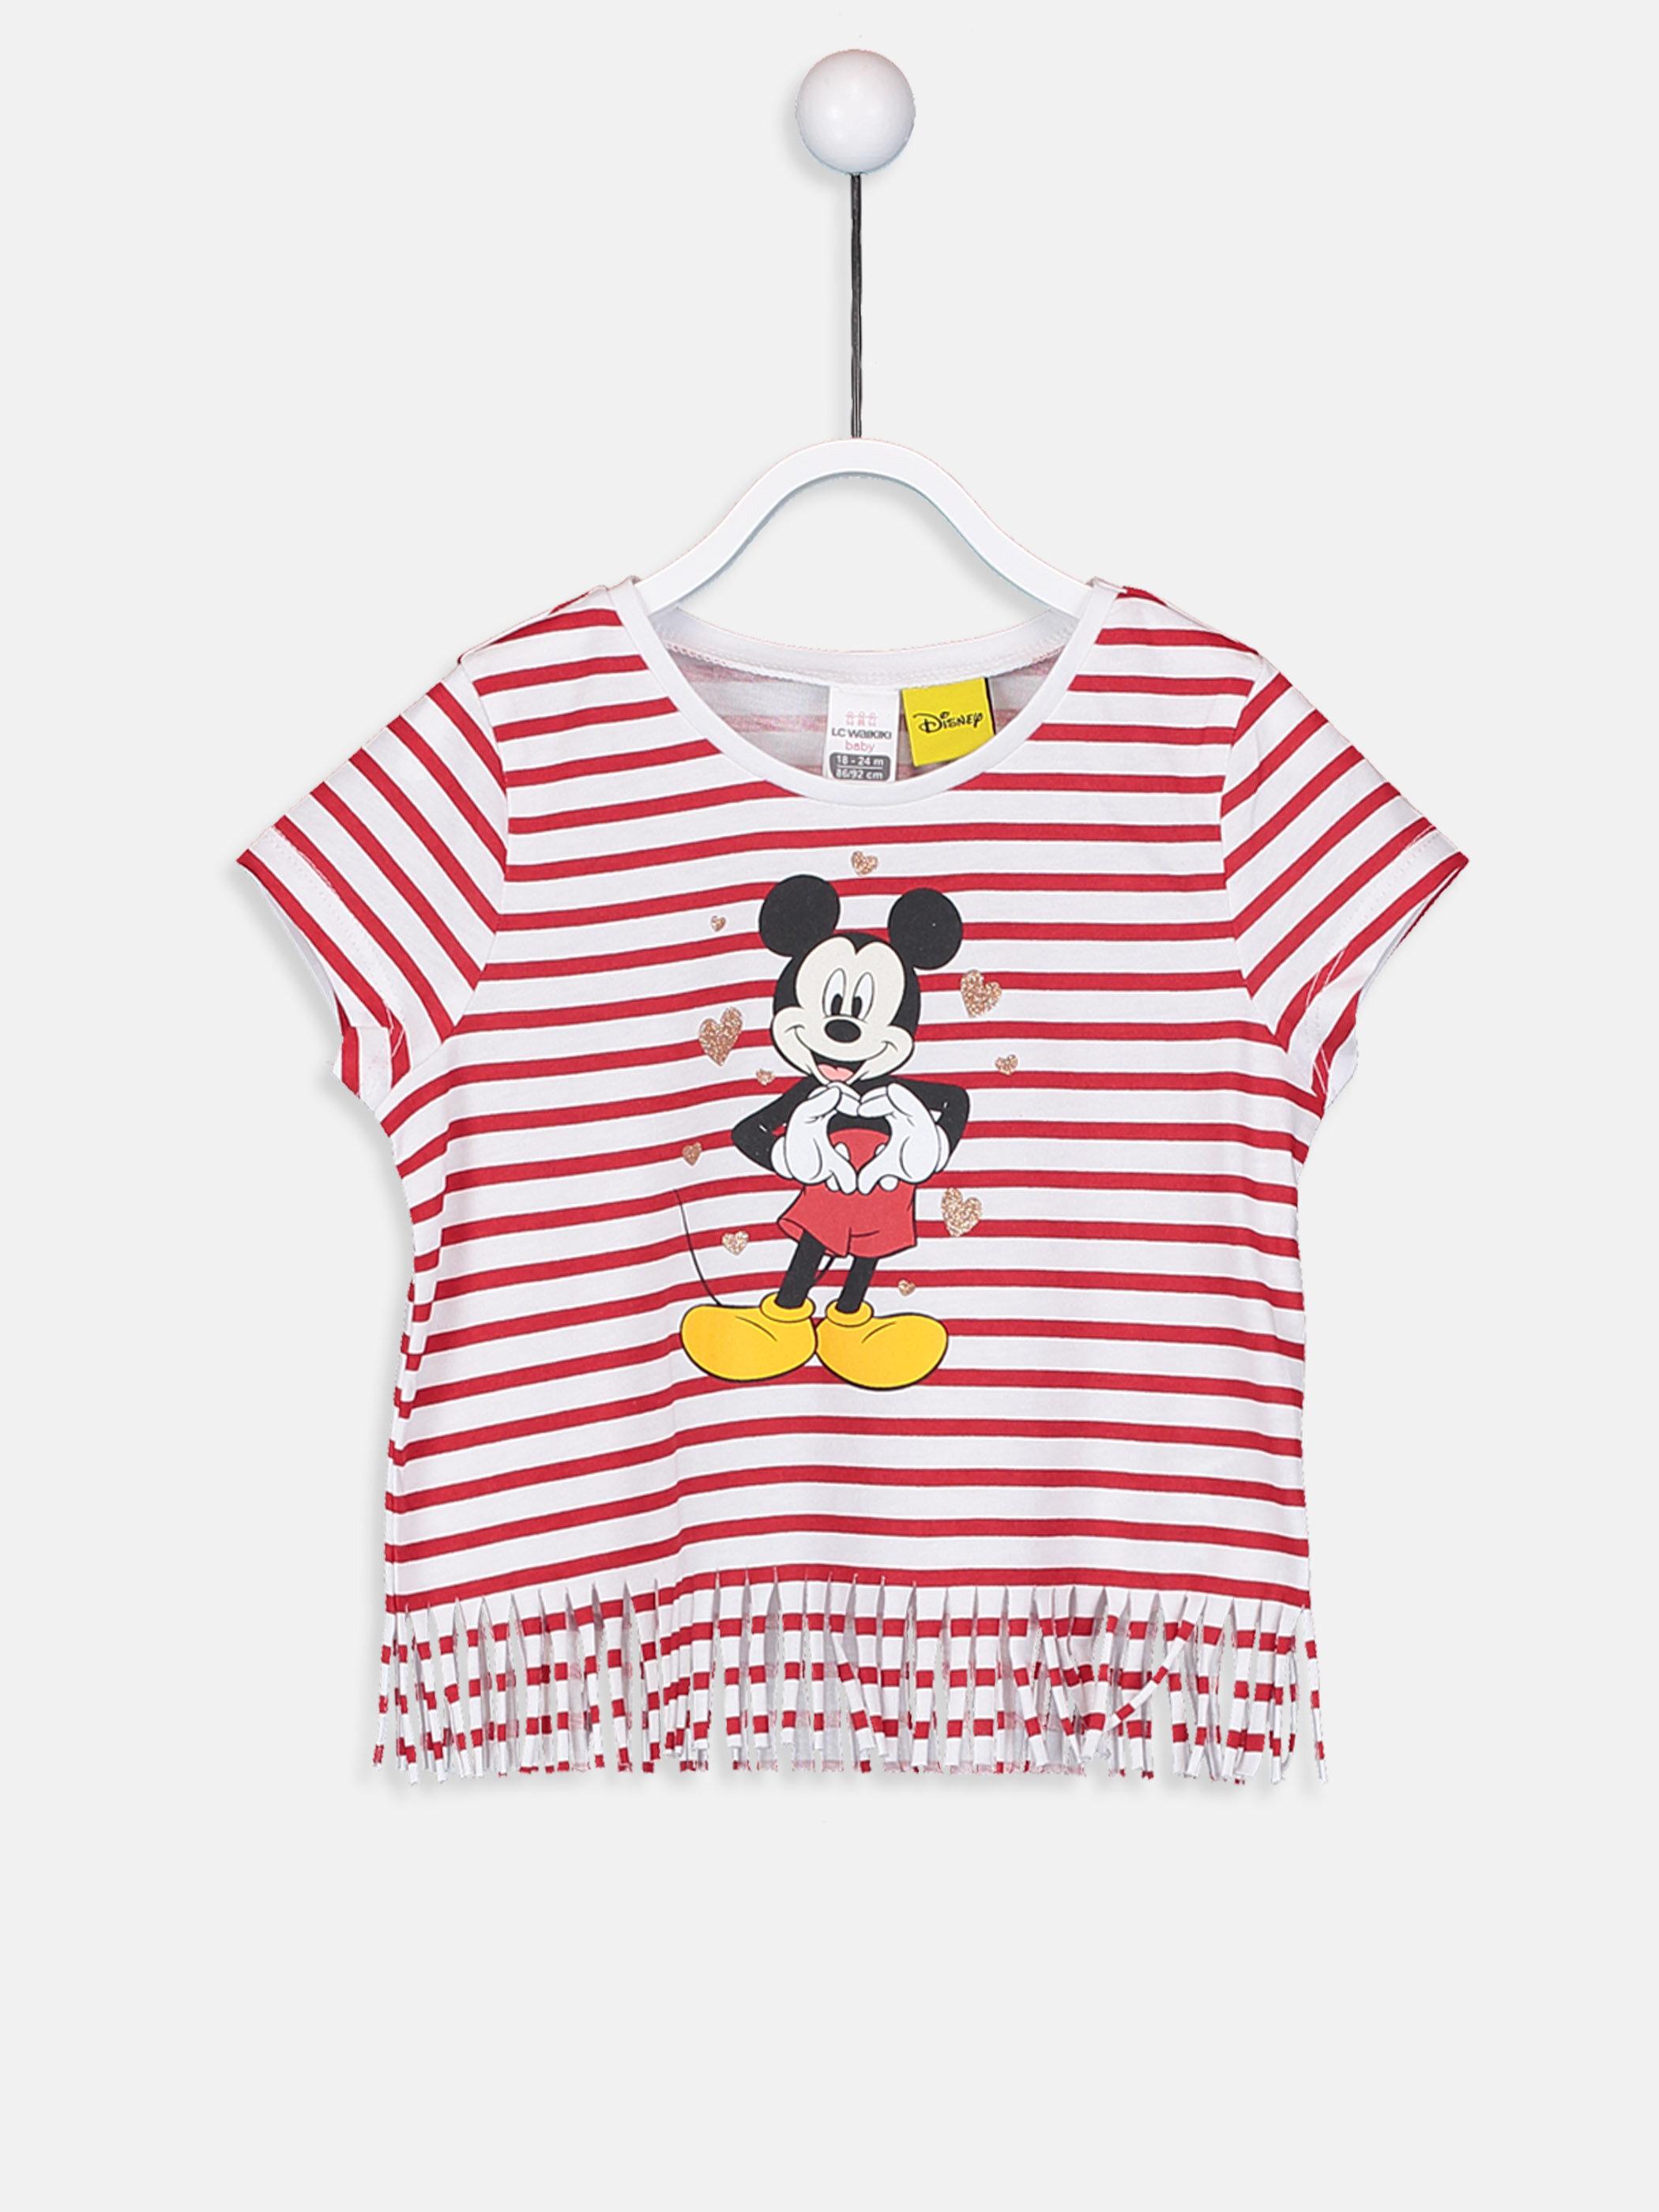 Kız Bebek Mickey Mouse Baskılı Tişört -9SQ549Z1-E48